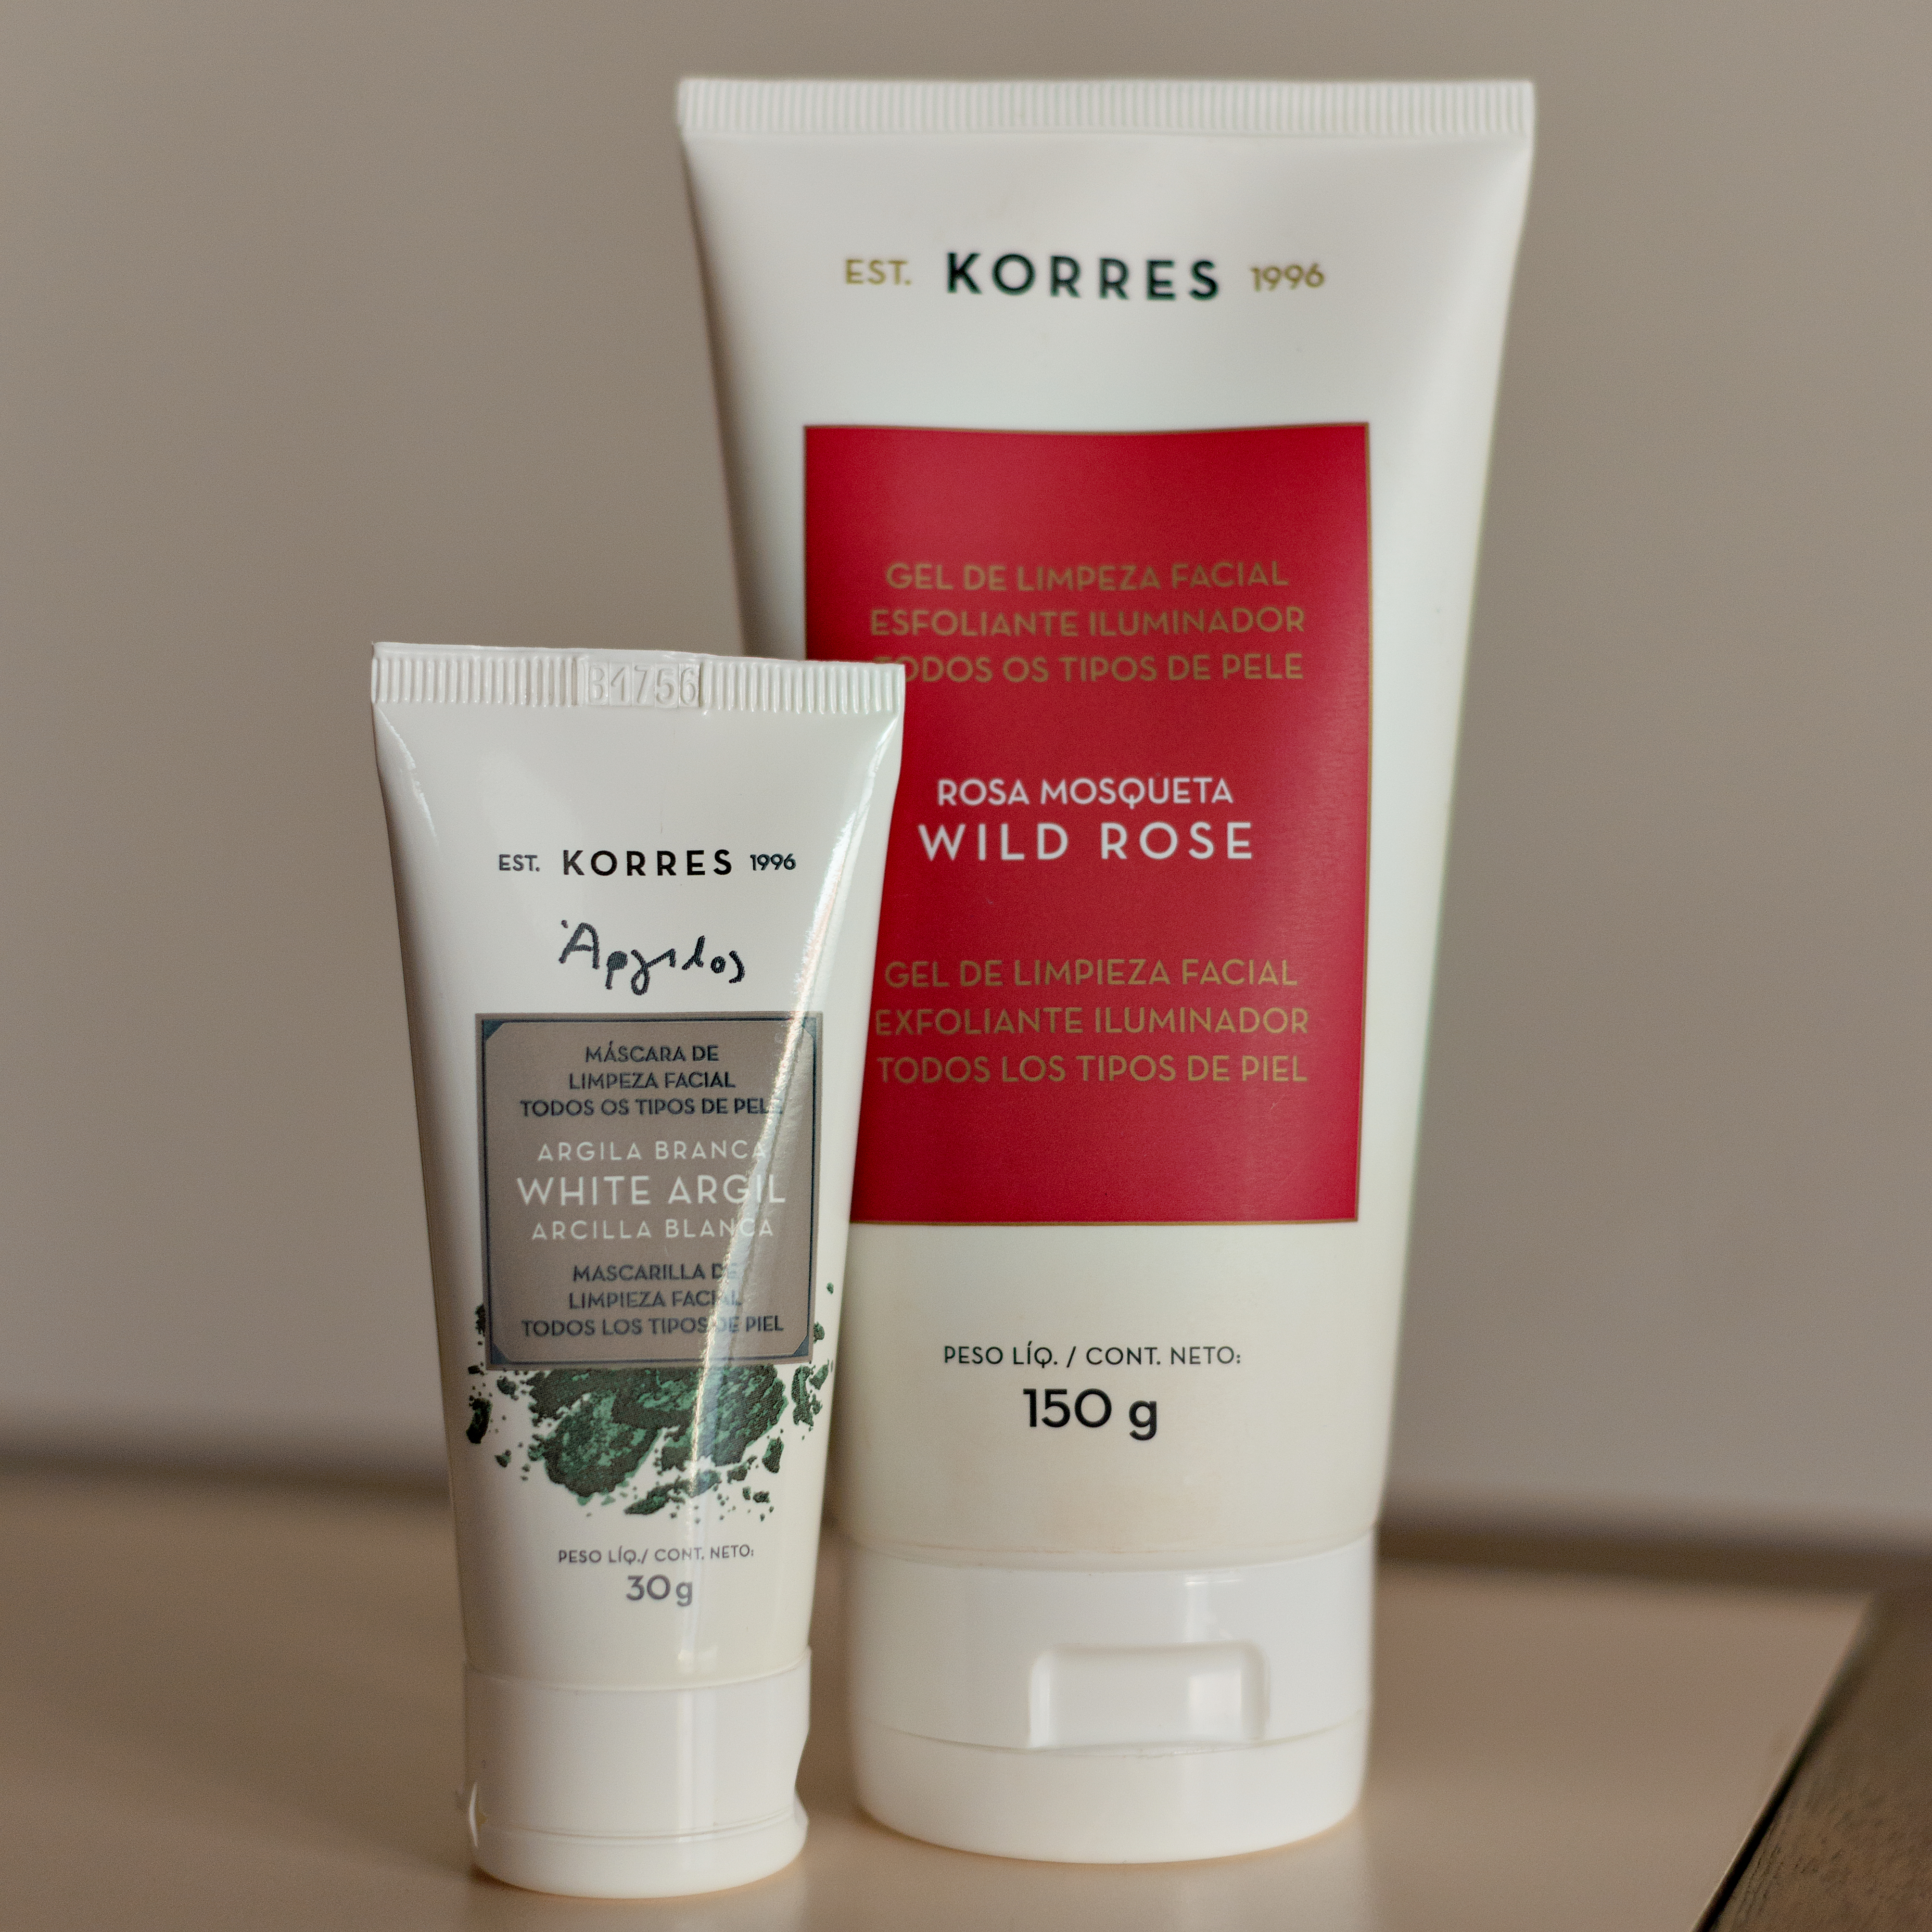 produtos korres, onde comprar korres, gel esfoliante korres, produto masculino, produto para o rosto, como tirar oleosidade, alex cursino, blog de moda masculina, grooming, dicas de moda para homens, (4)